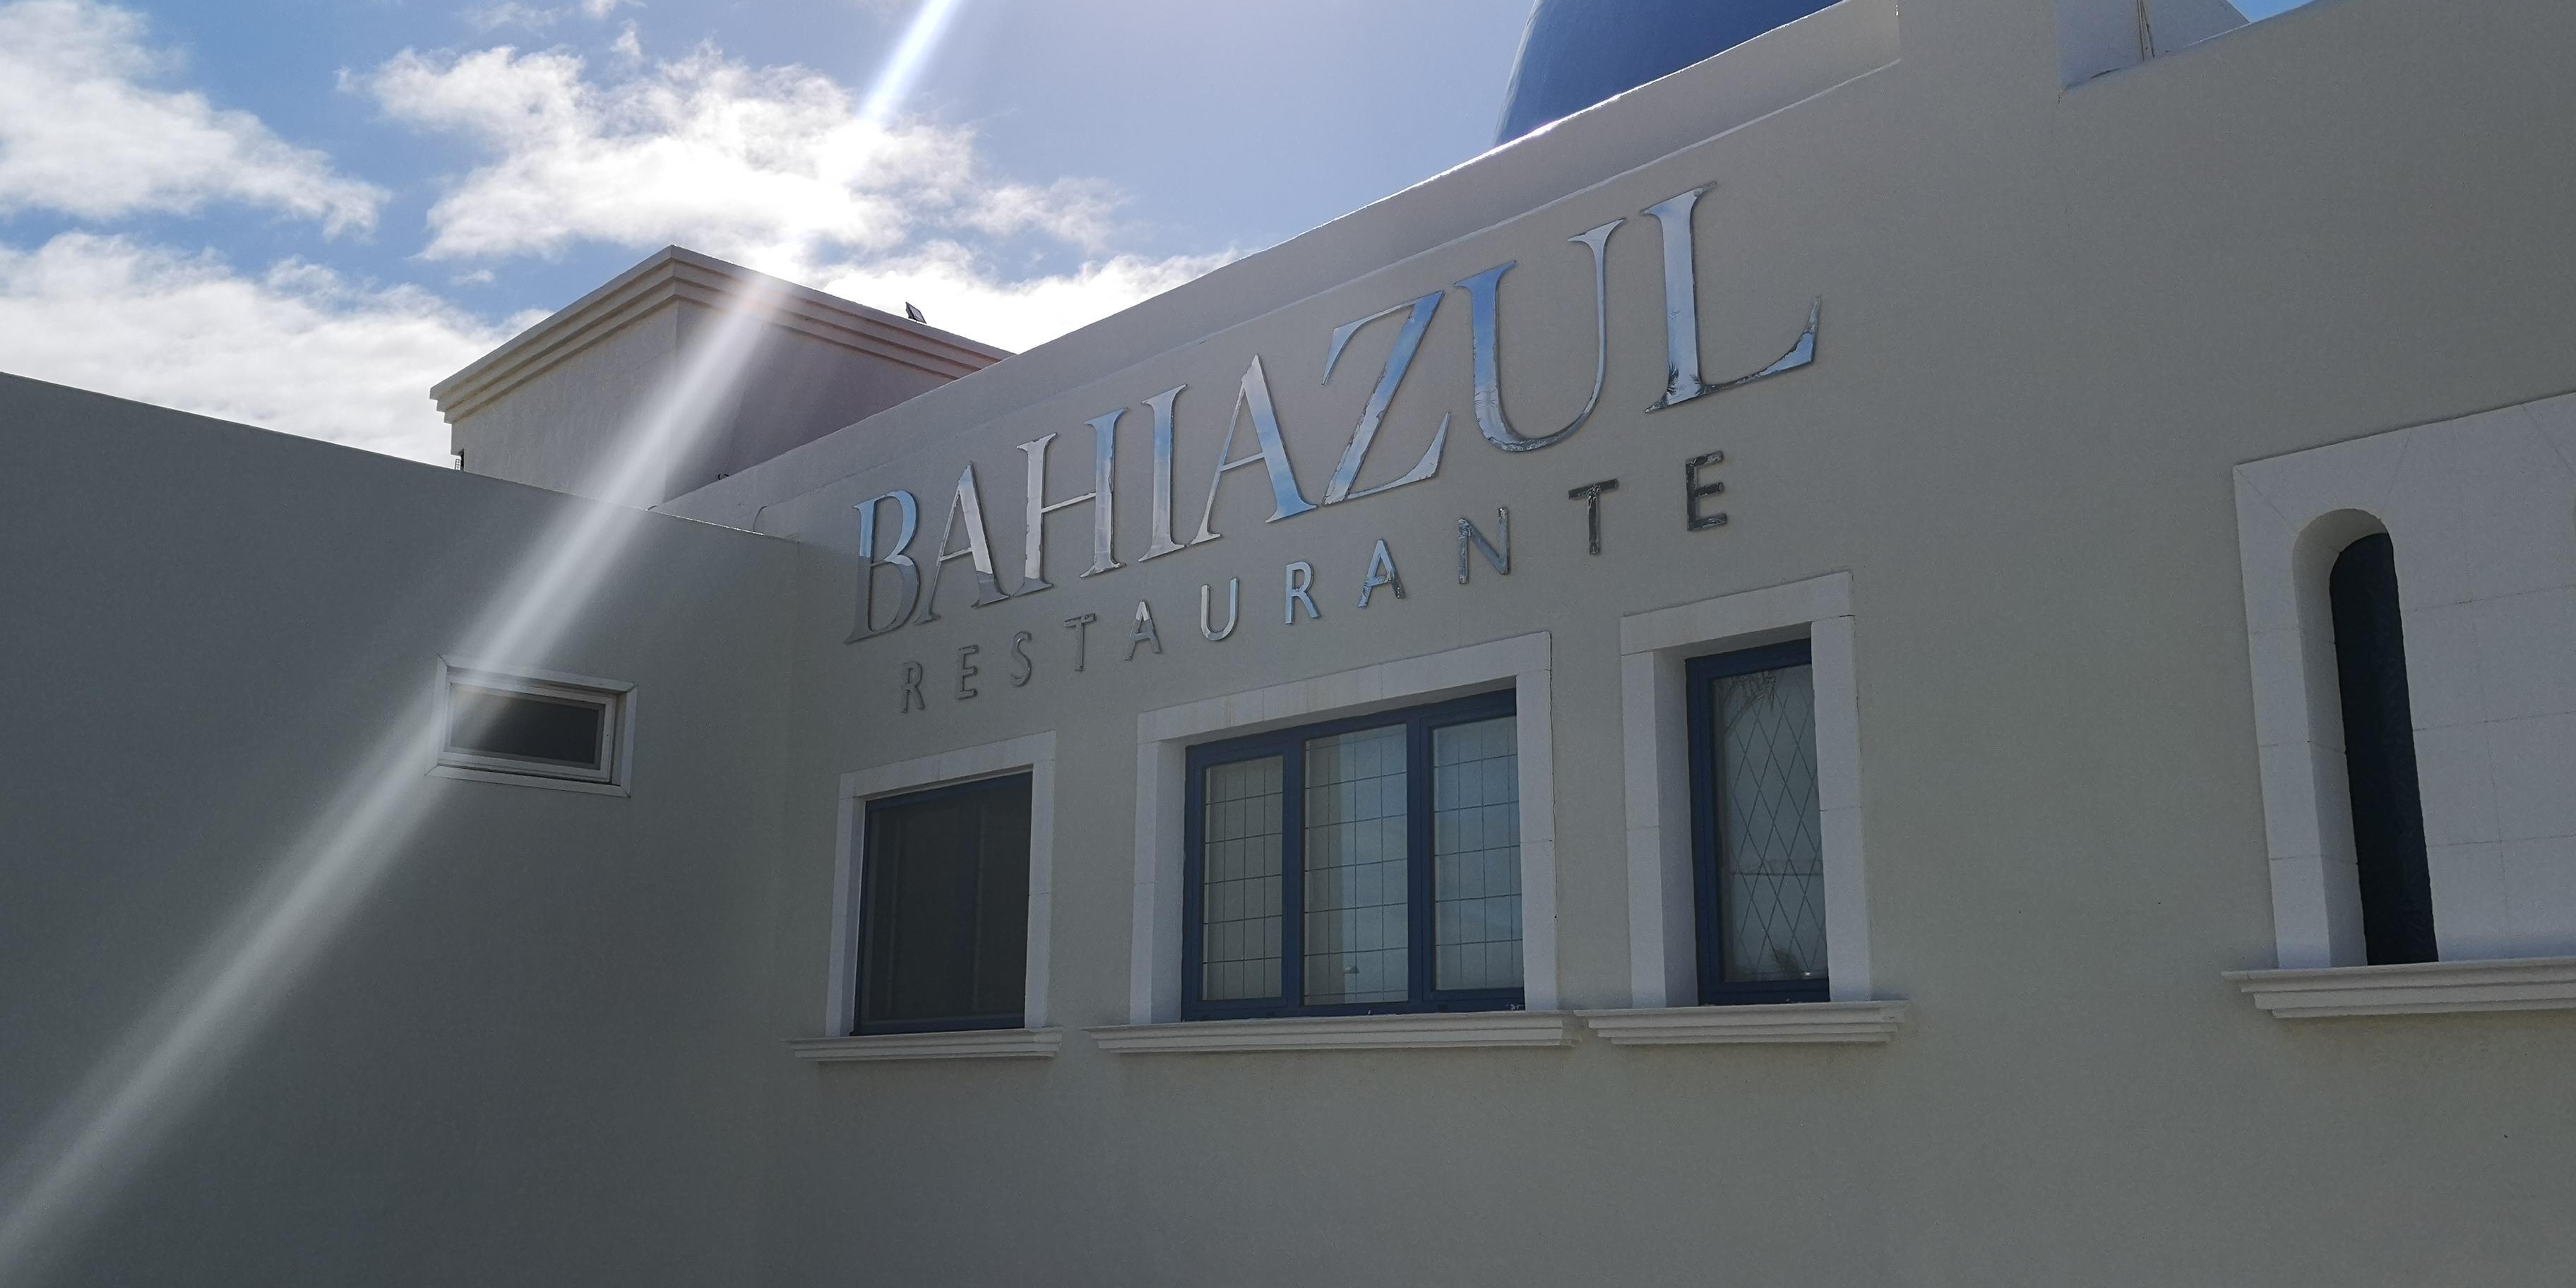 Bahiazul Villas & Club - Fuerteventura (La Oliva) – 2019 ...